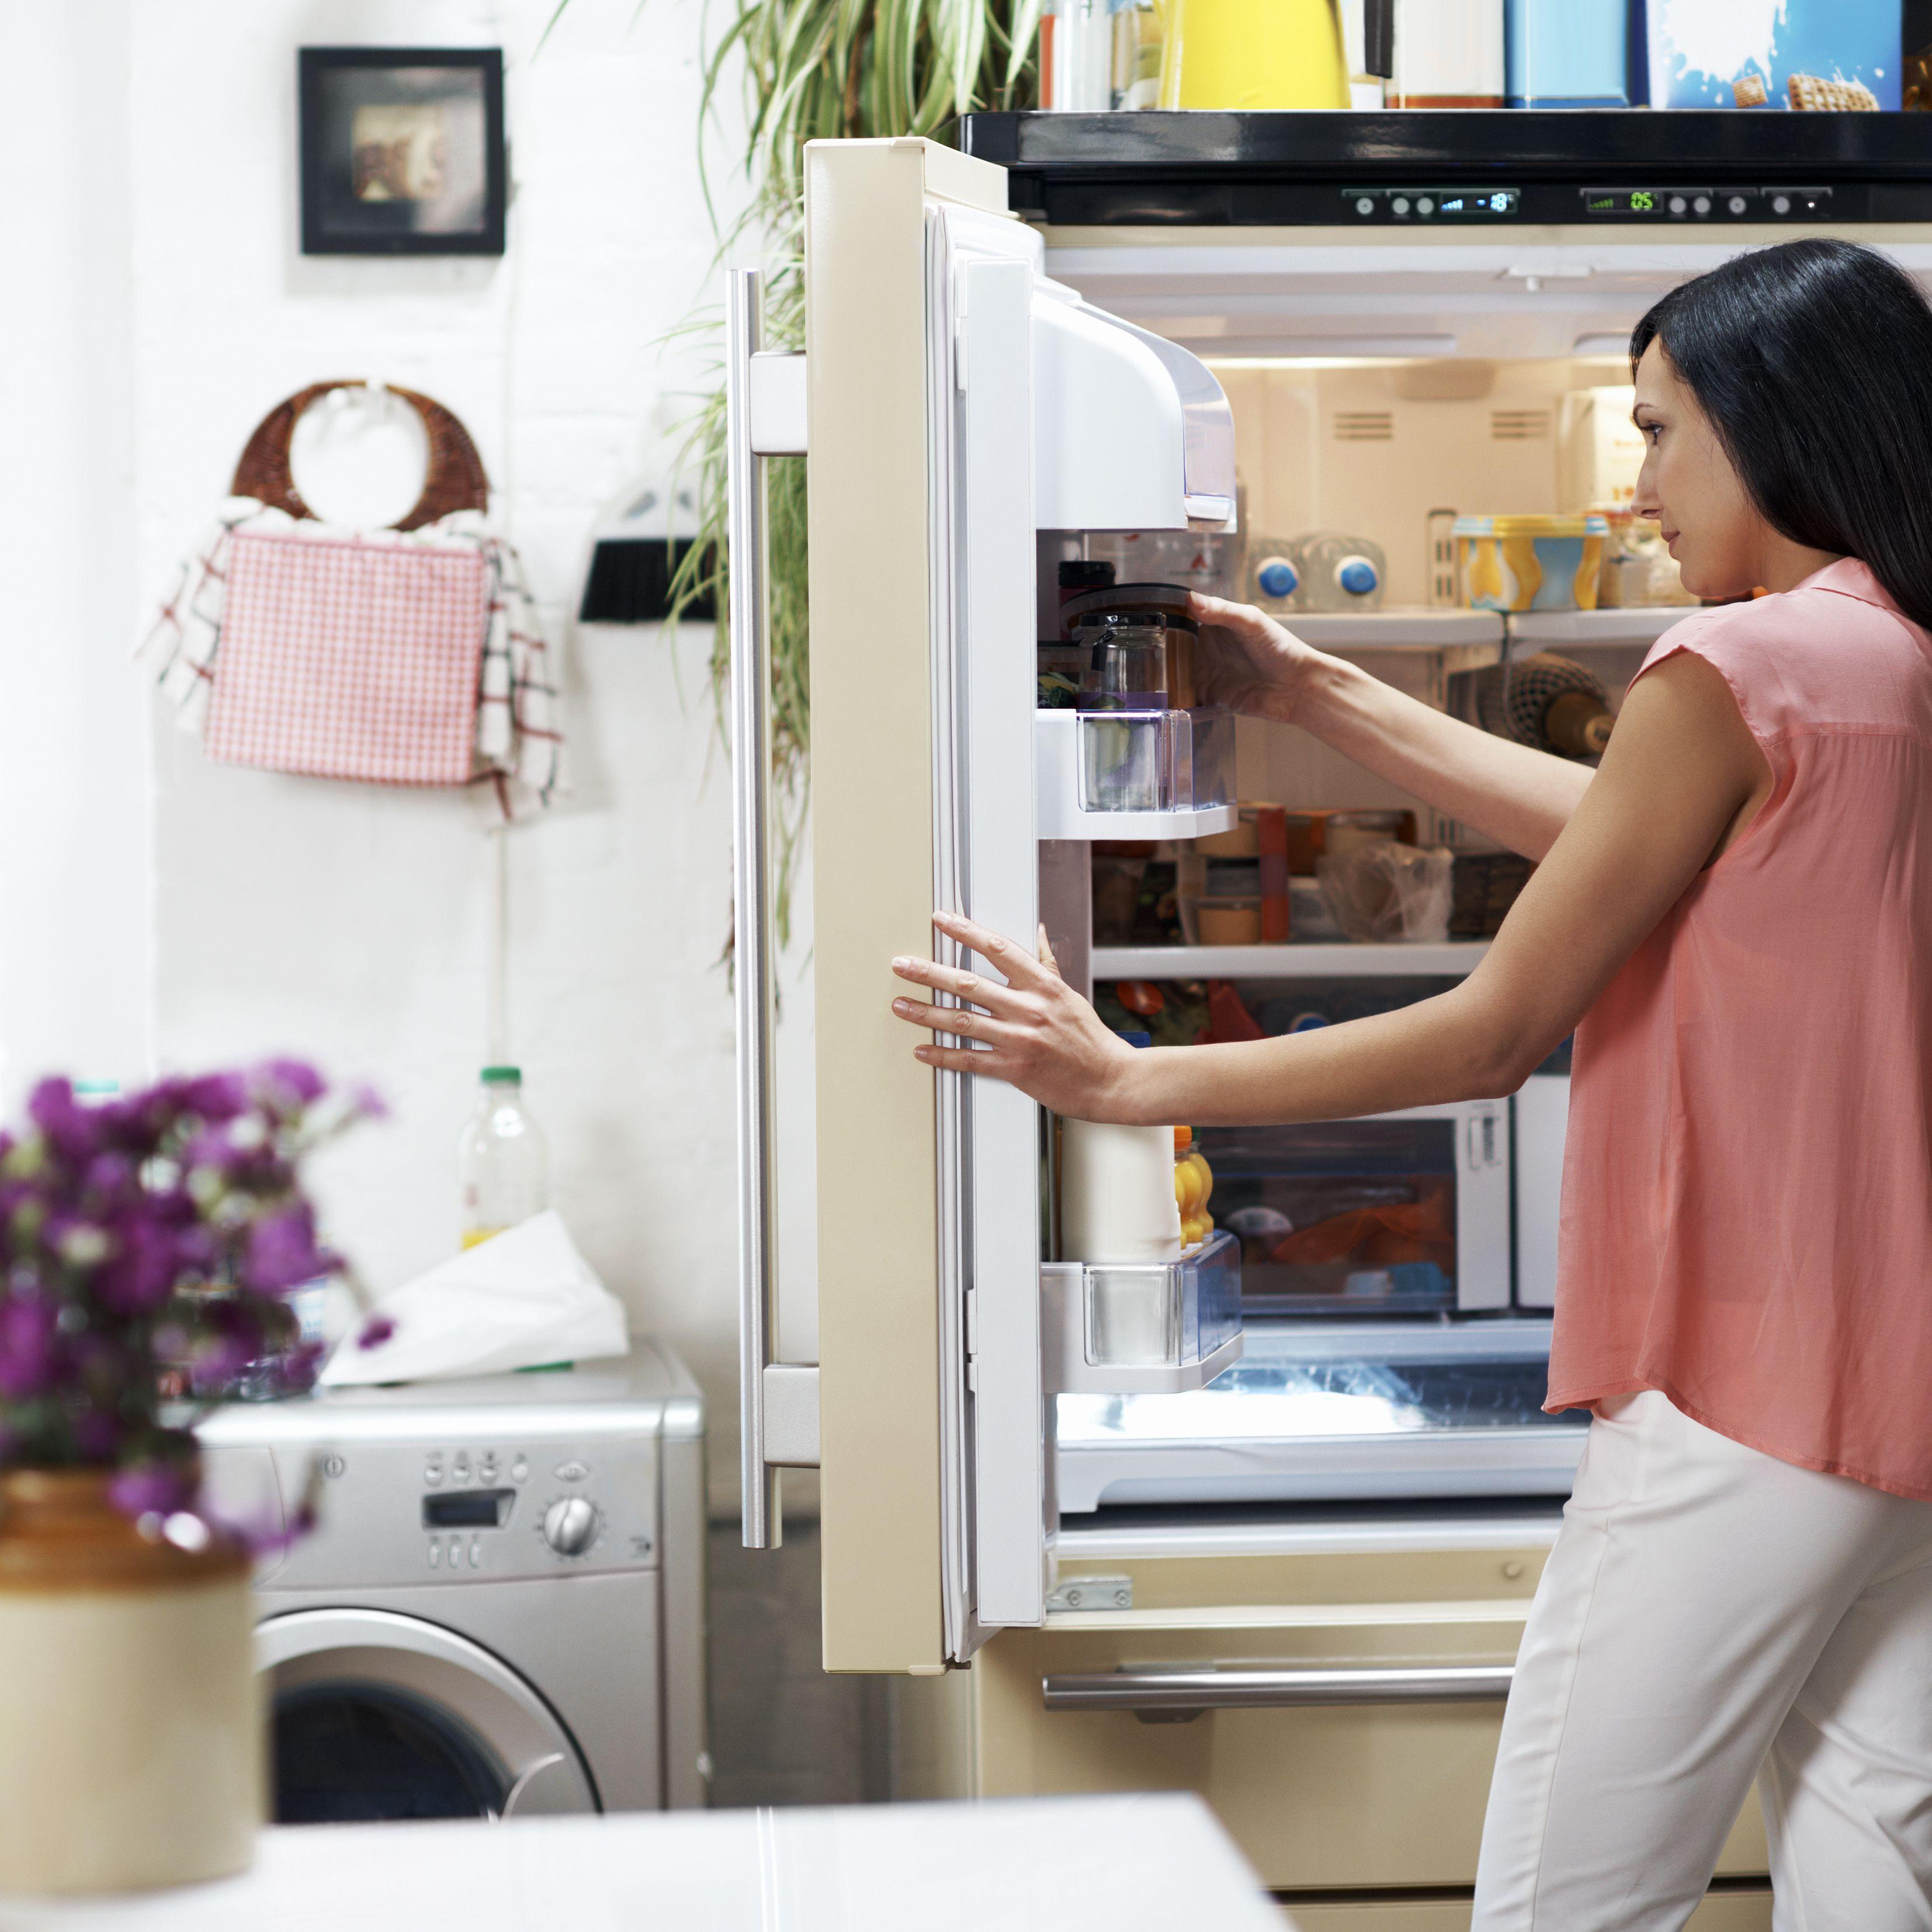 Using Baking Soda in the Refrigerator